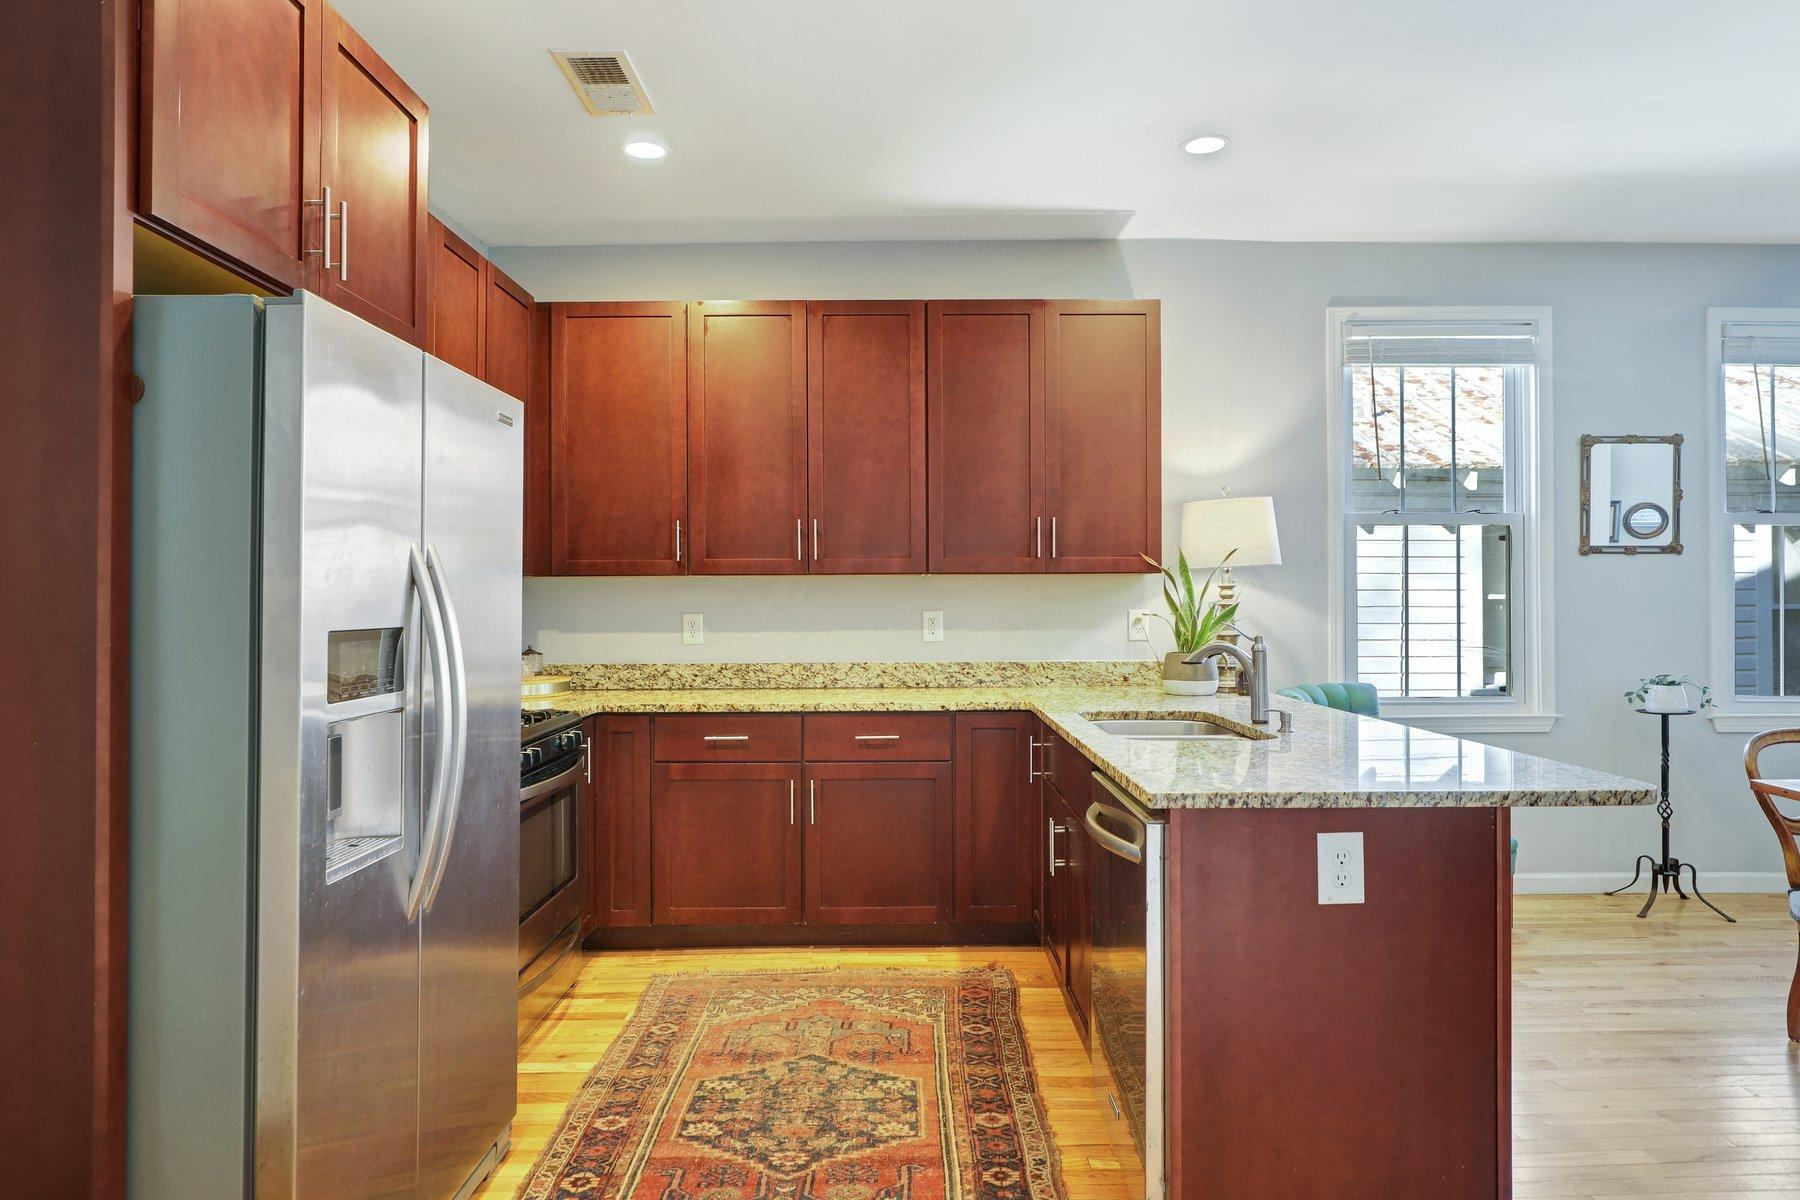 Rutledge Green Homes For Sale - 791 Rutledge, Charleston, SC - 5